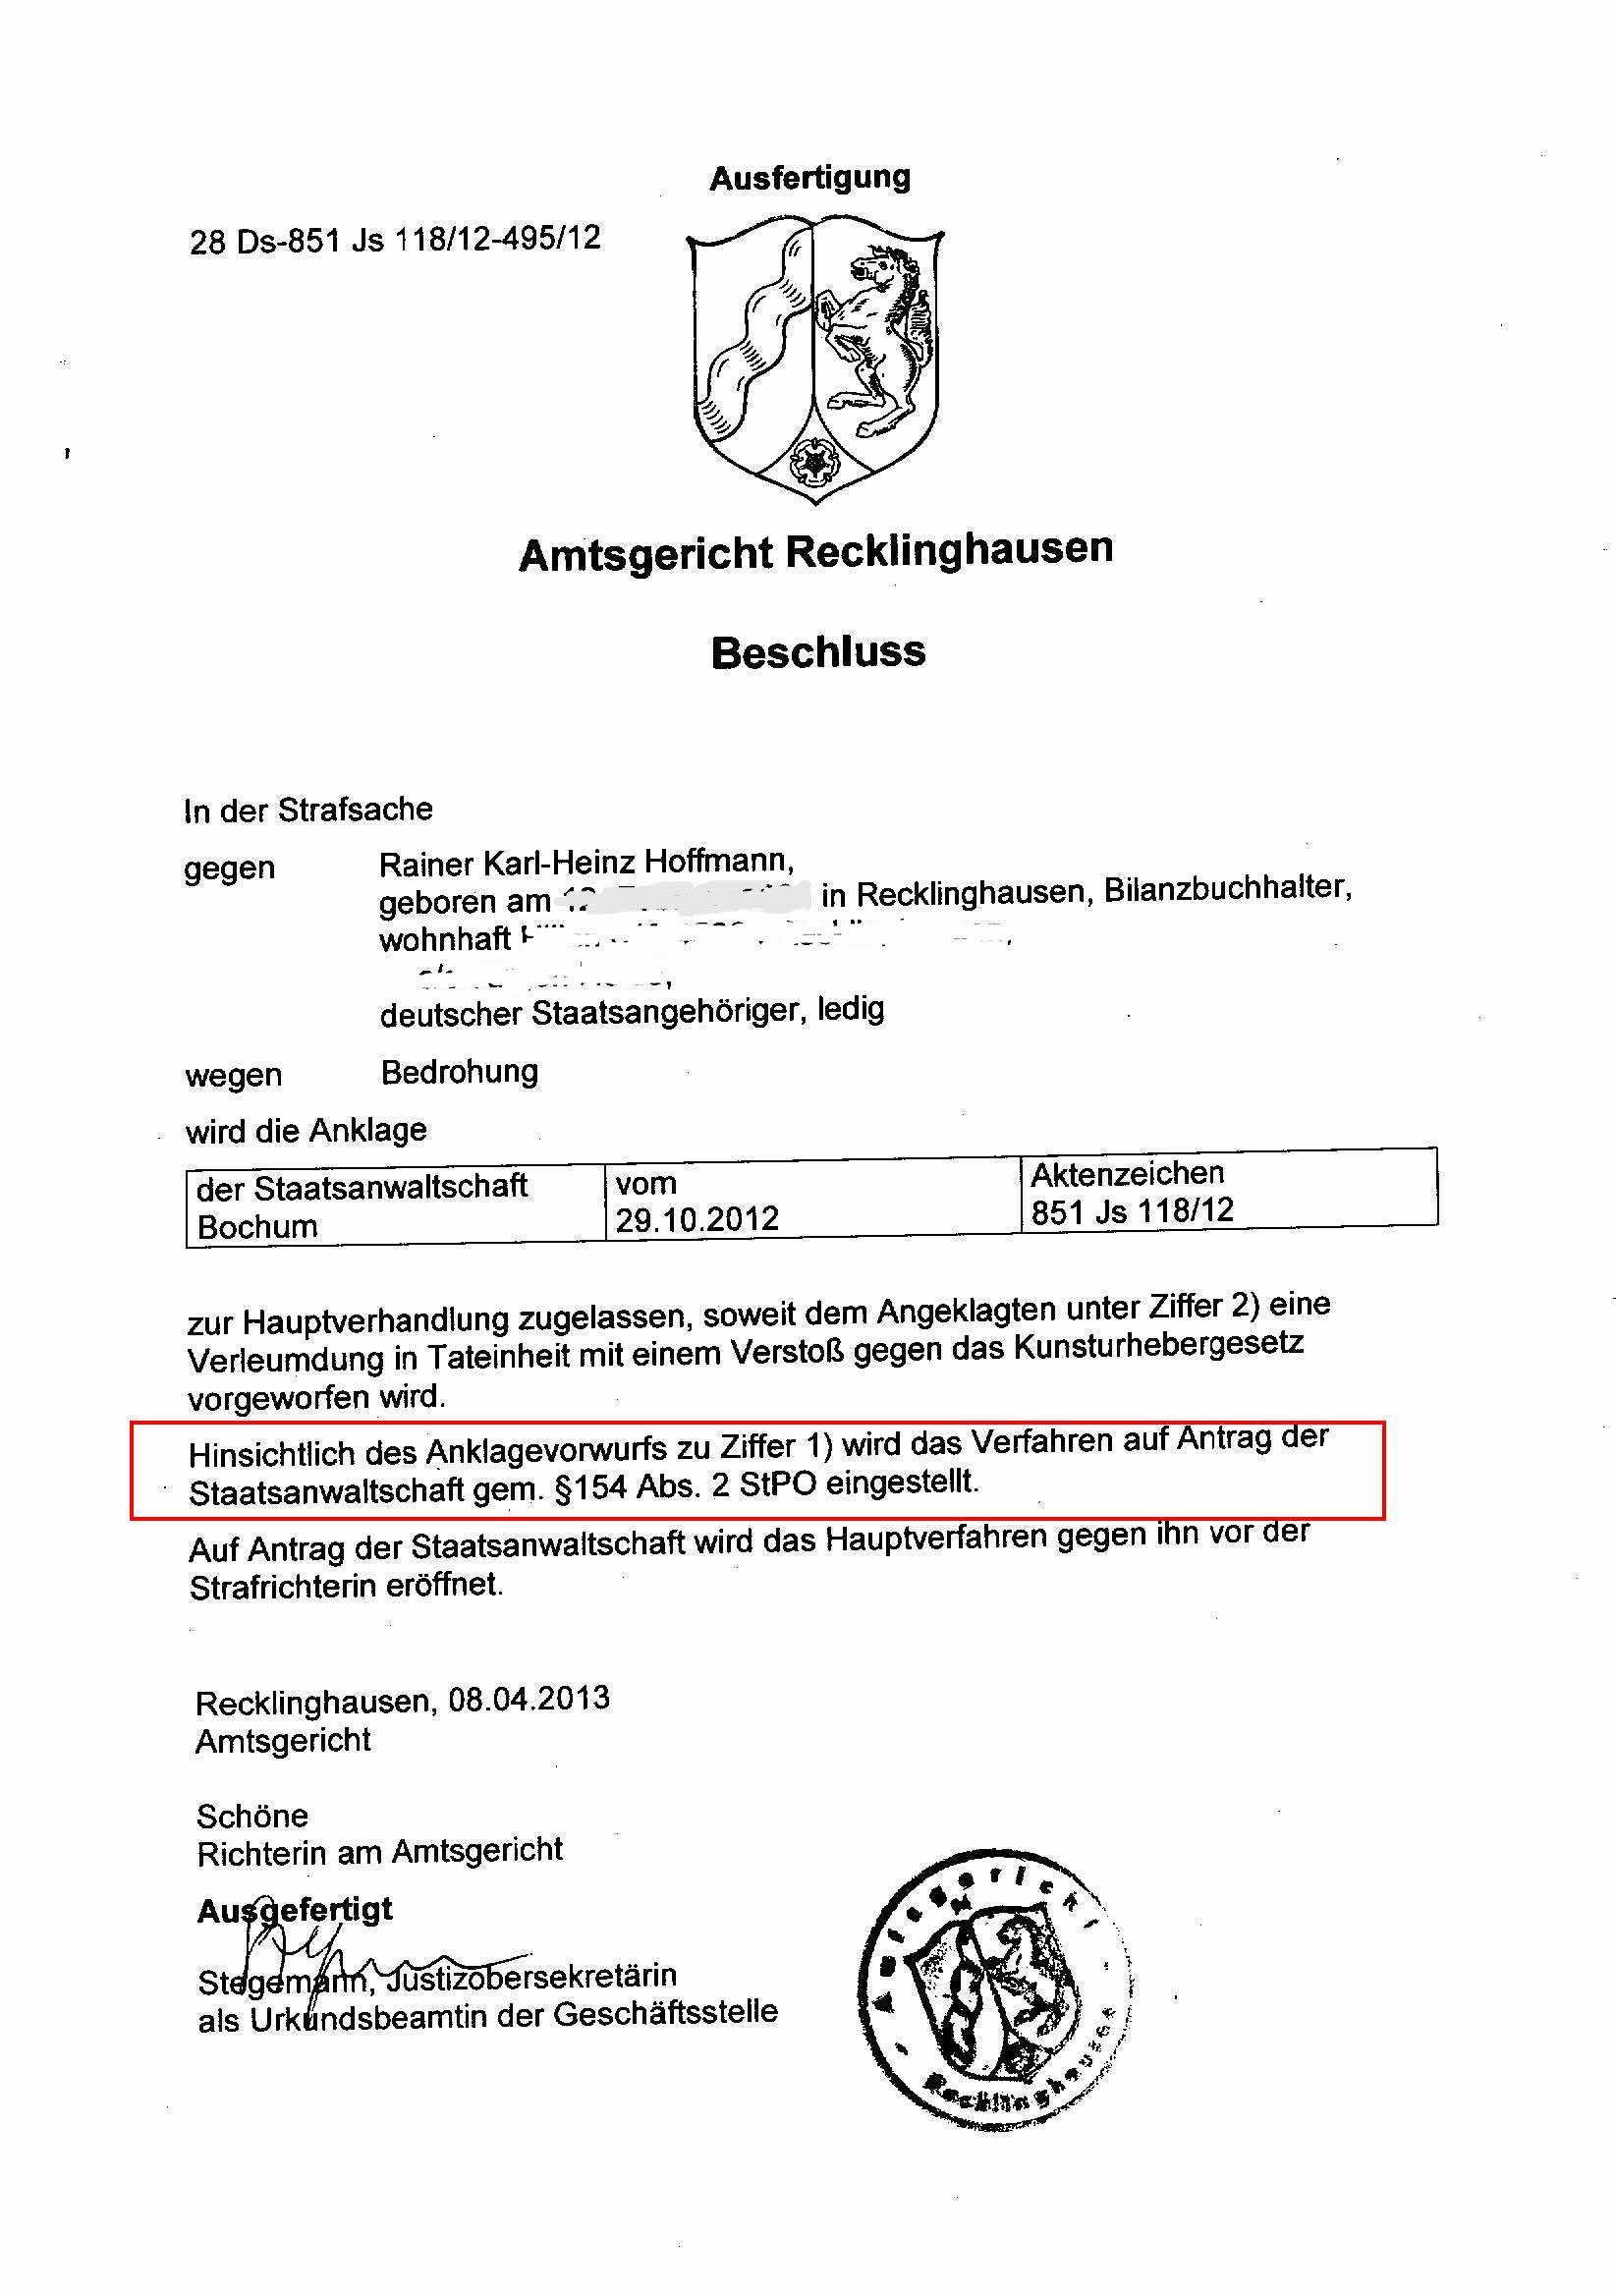 Wie Das Amtsgericht Recklinghausen Dem Solarkritiker Den Gesetzlichen Richter Art 101 Gg Entzogen Hat Solarkritik De Die Geheimakte Hoffmann